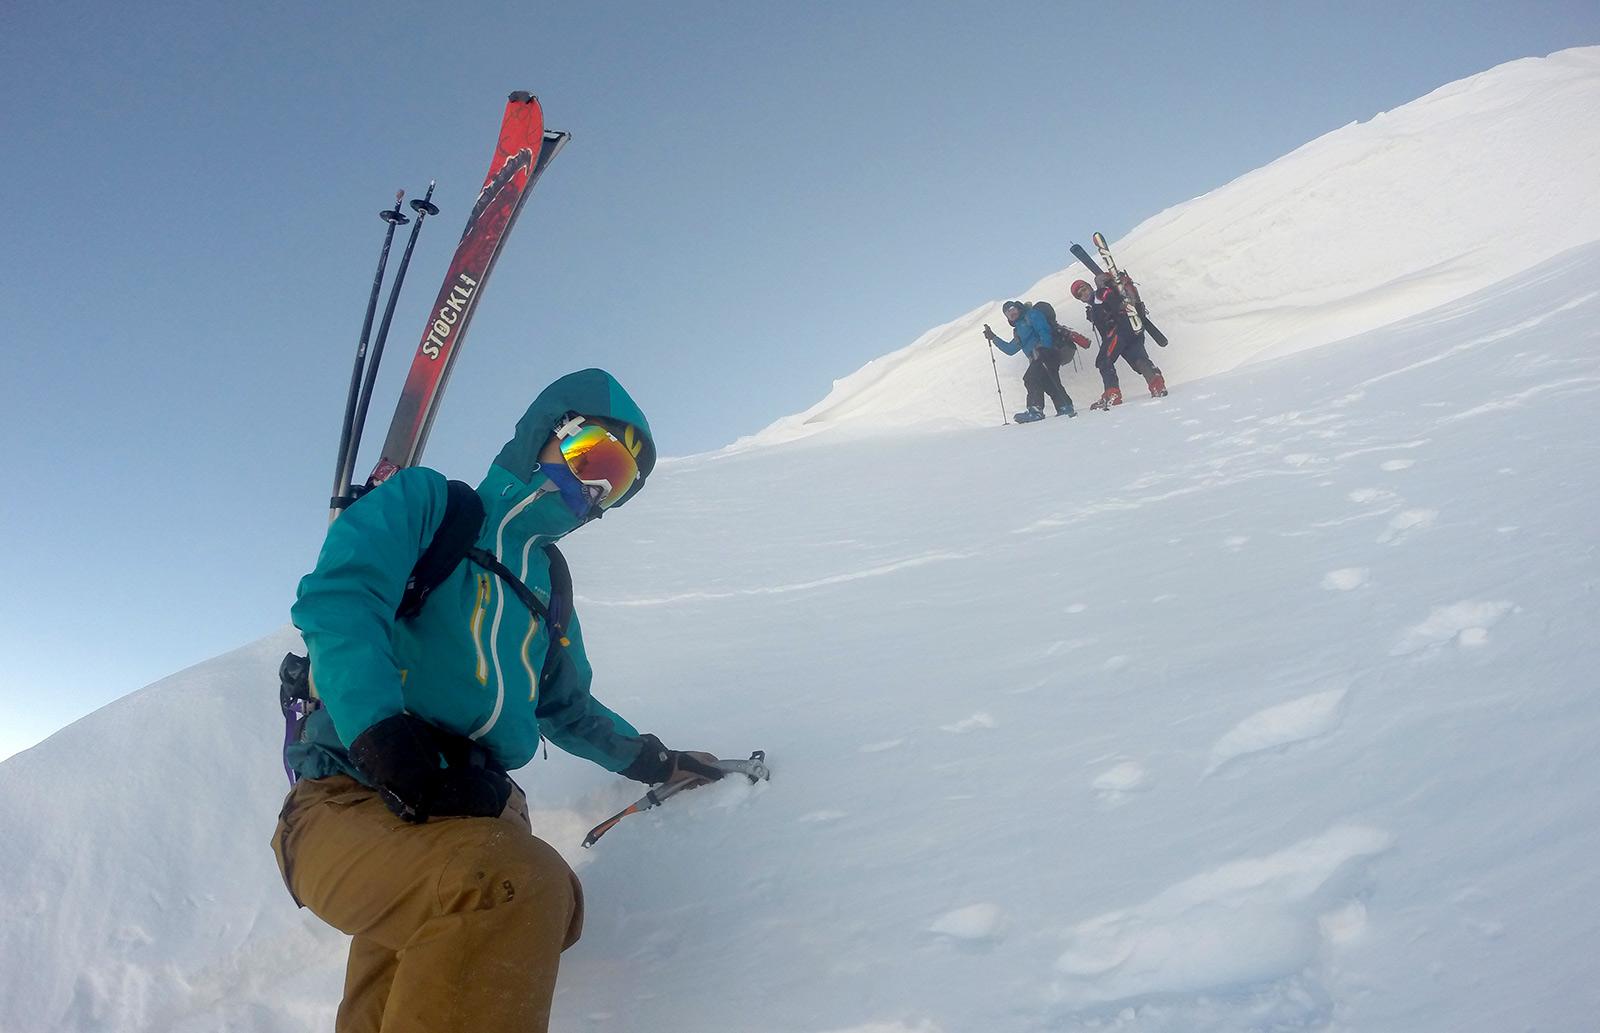 Najstrmiji deo uspona i snežna streha na grebenu. Foto: Semir Kardović